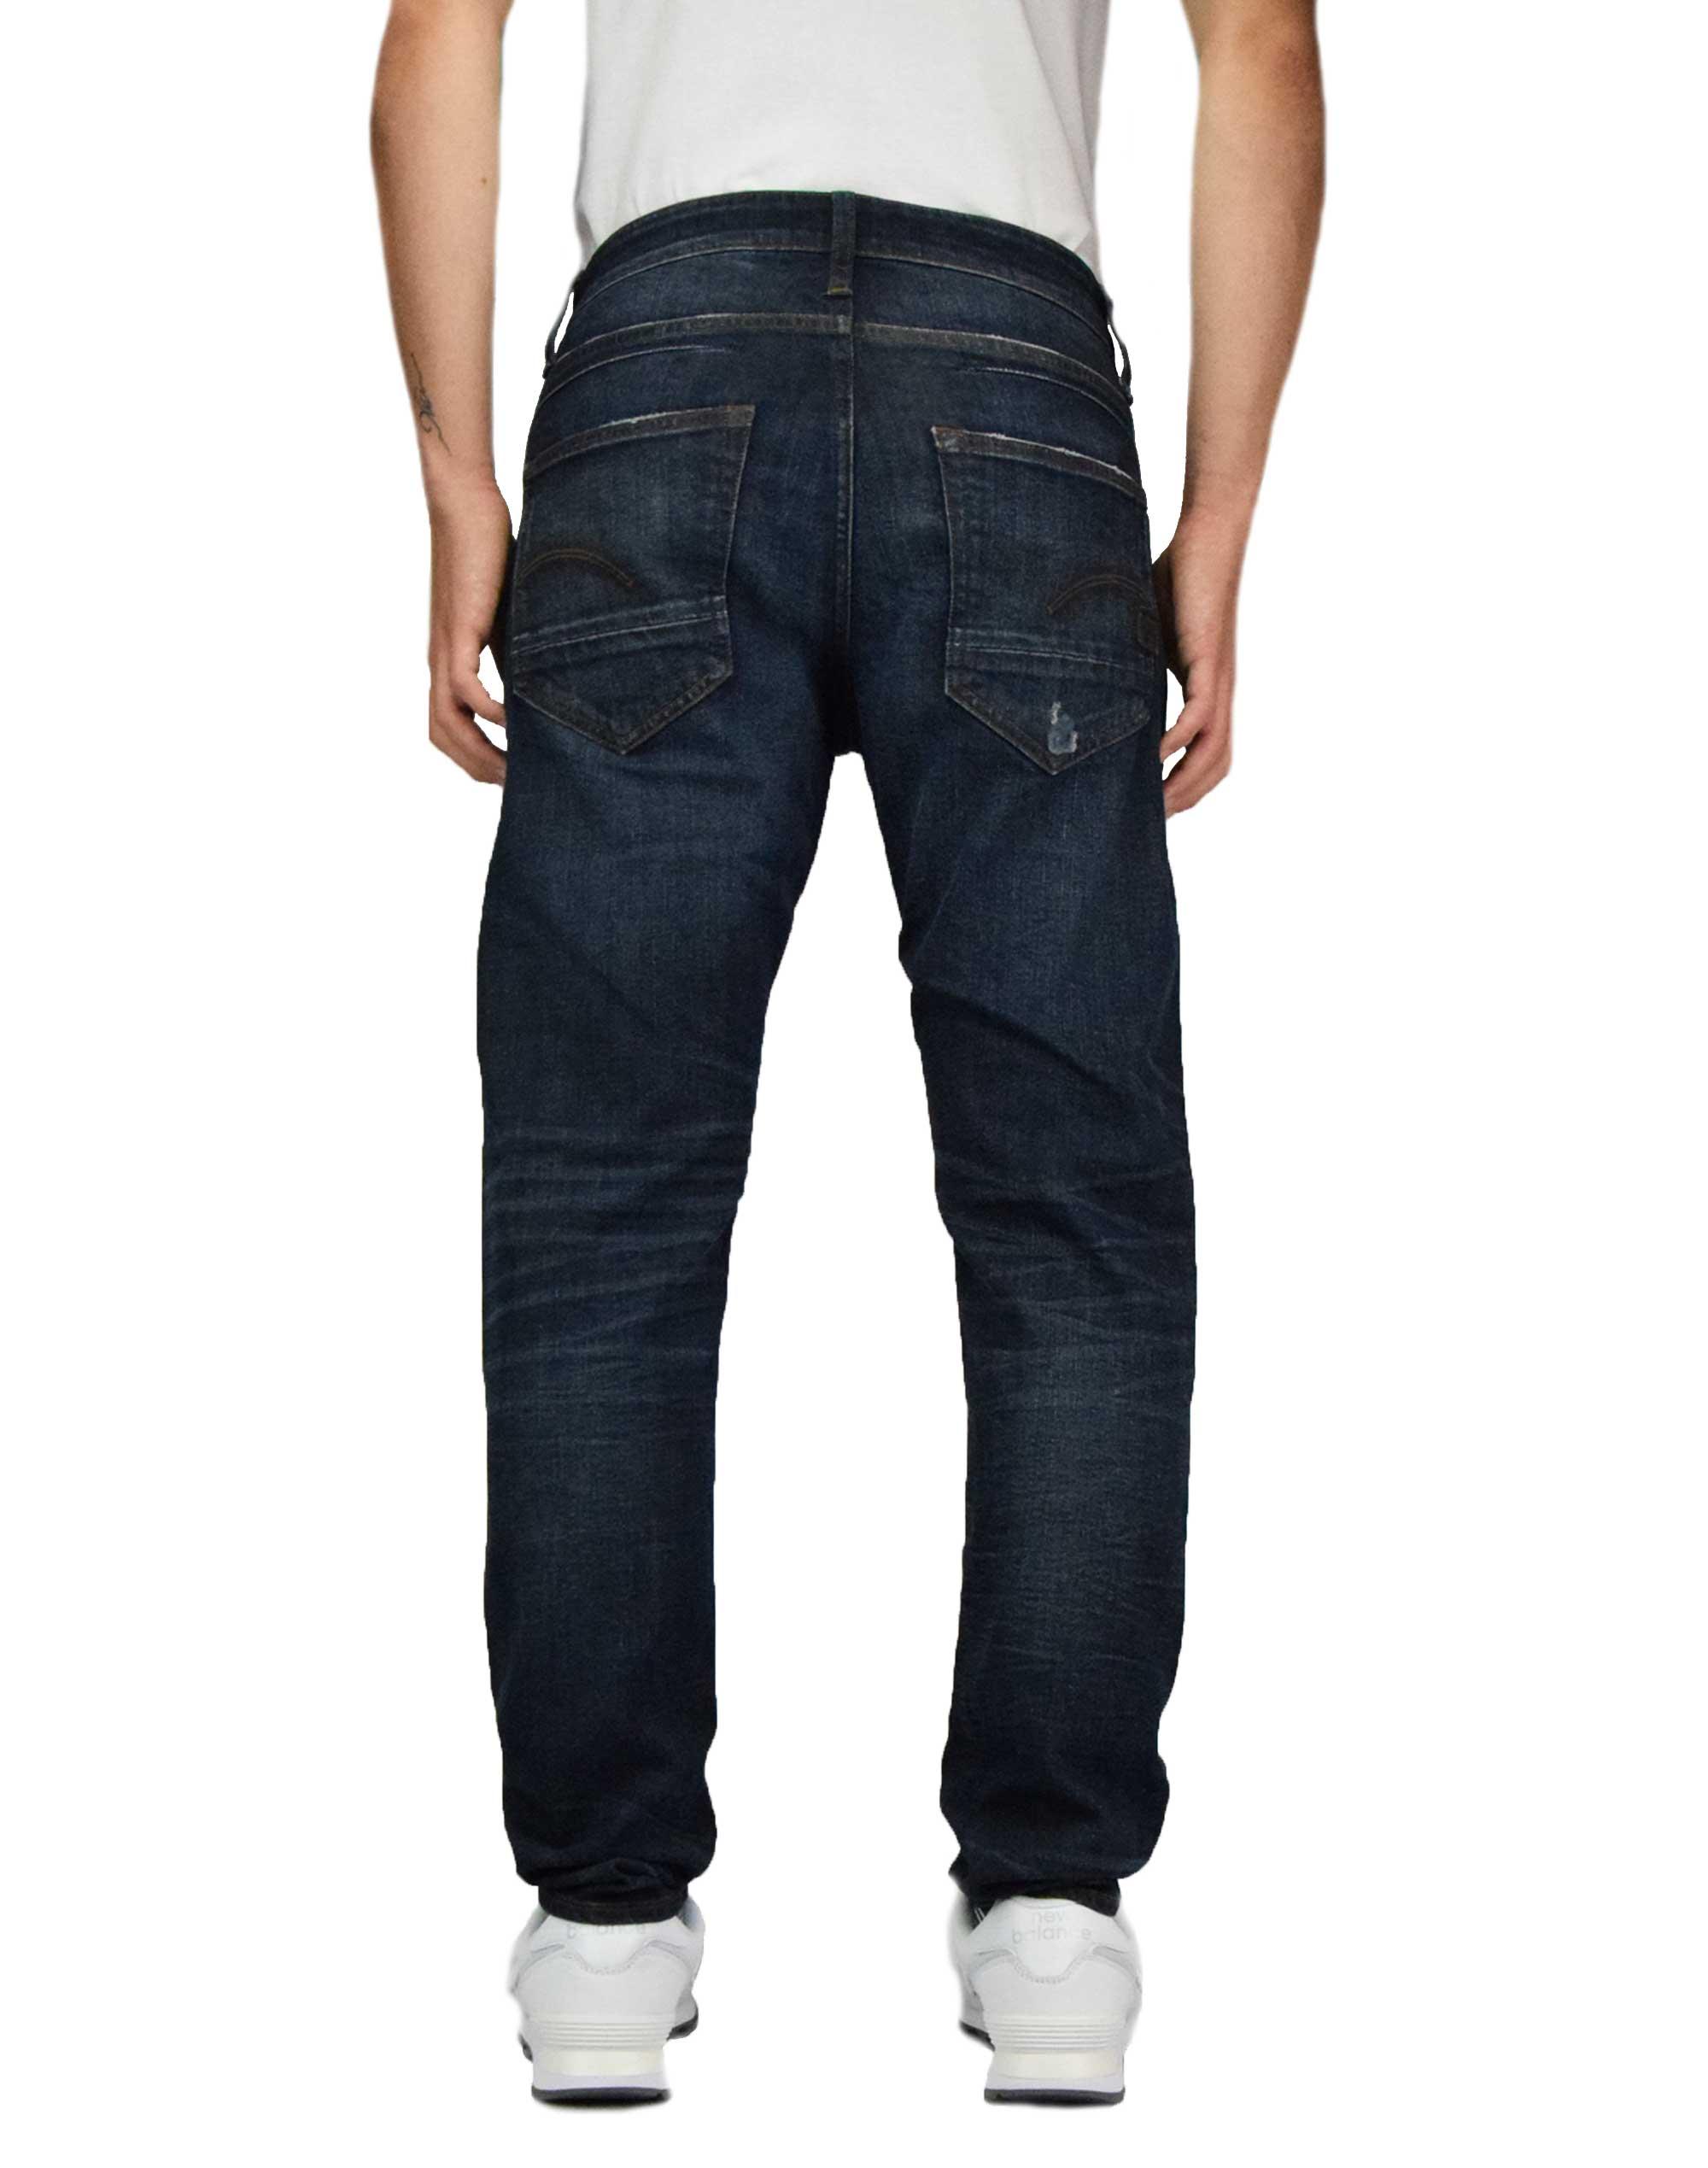 G-Star Raw D-Staq 5 Pocket Slim (D06761-B767-A943) Antic Nile